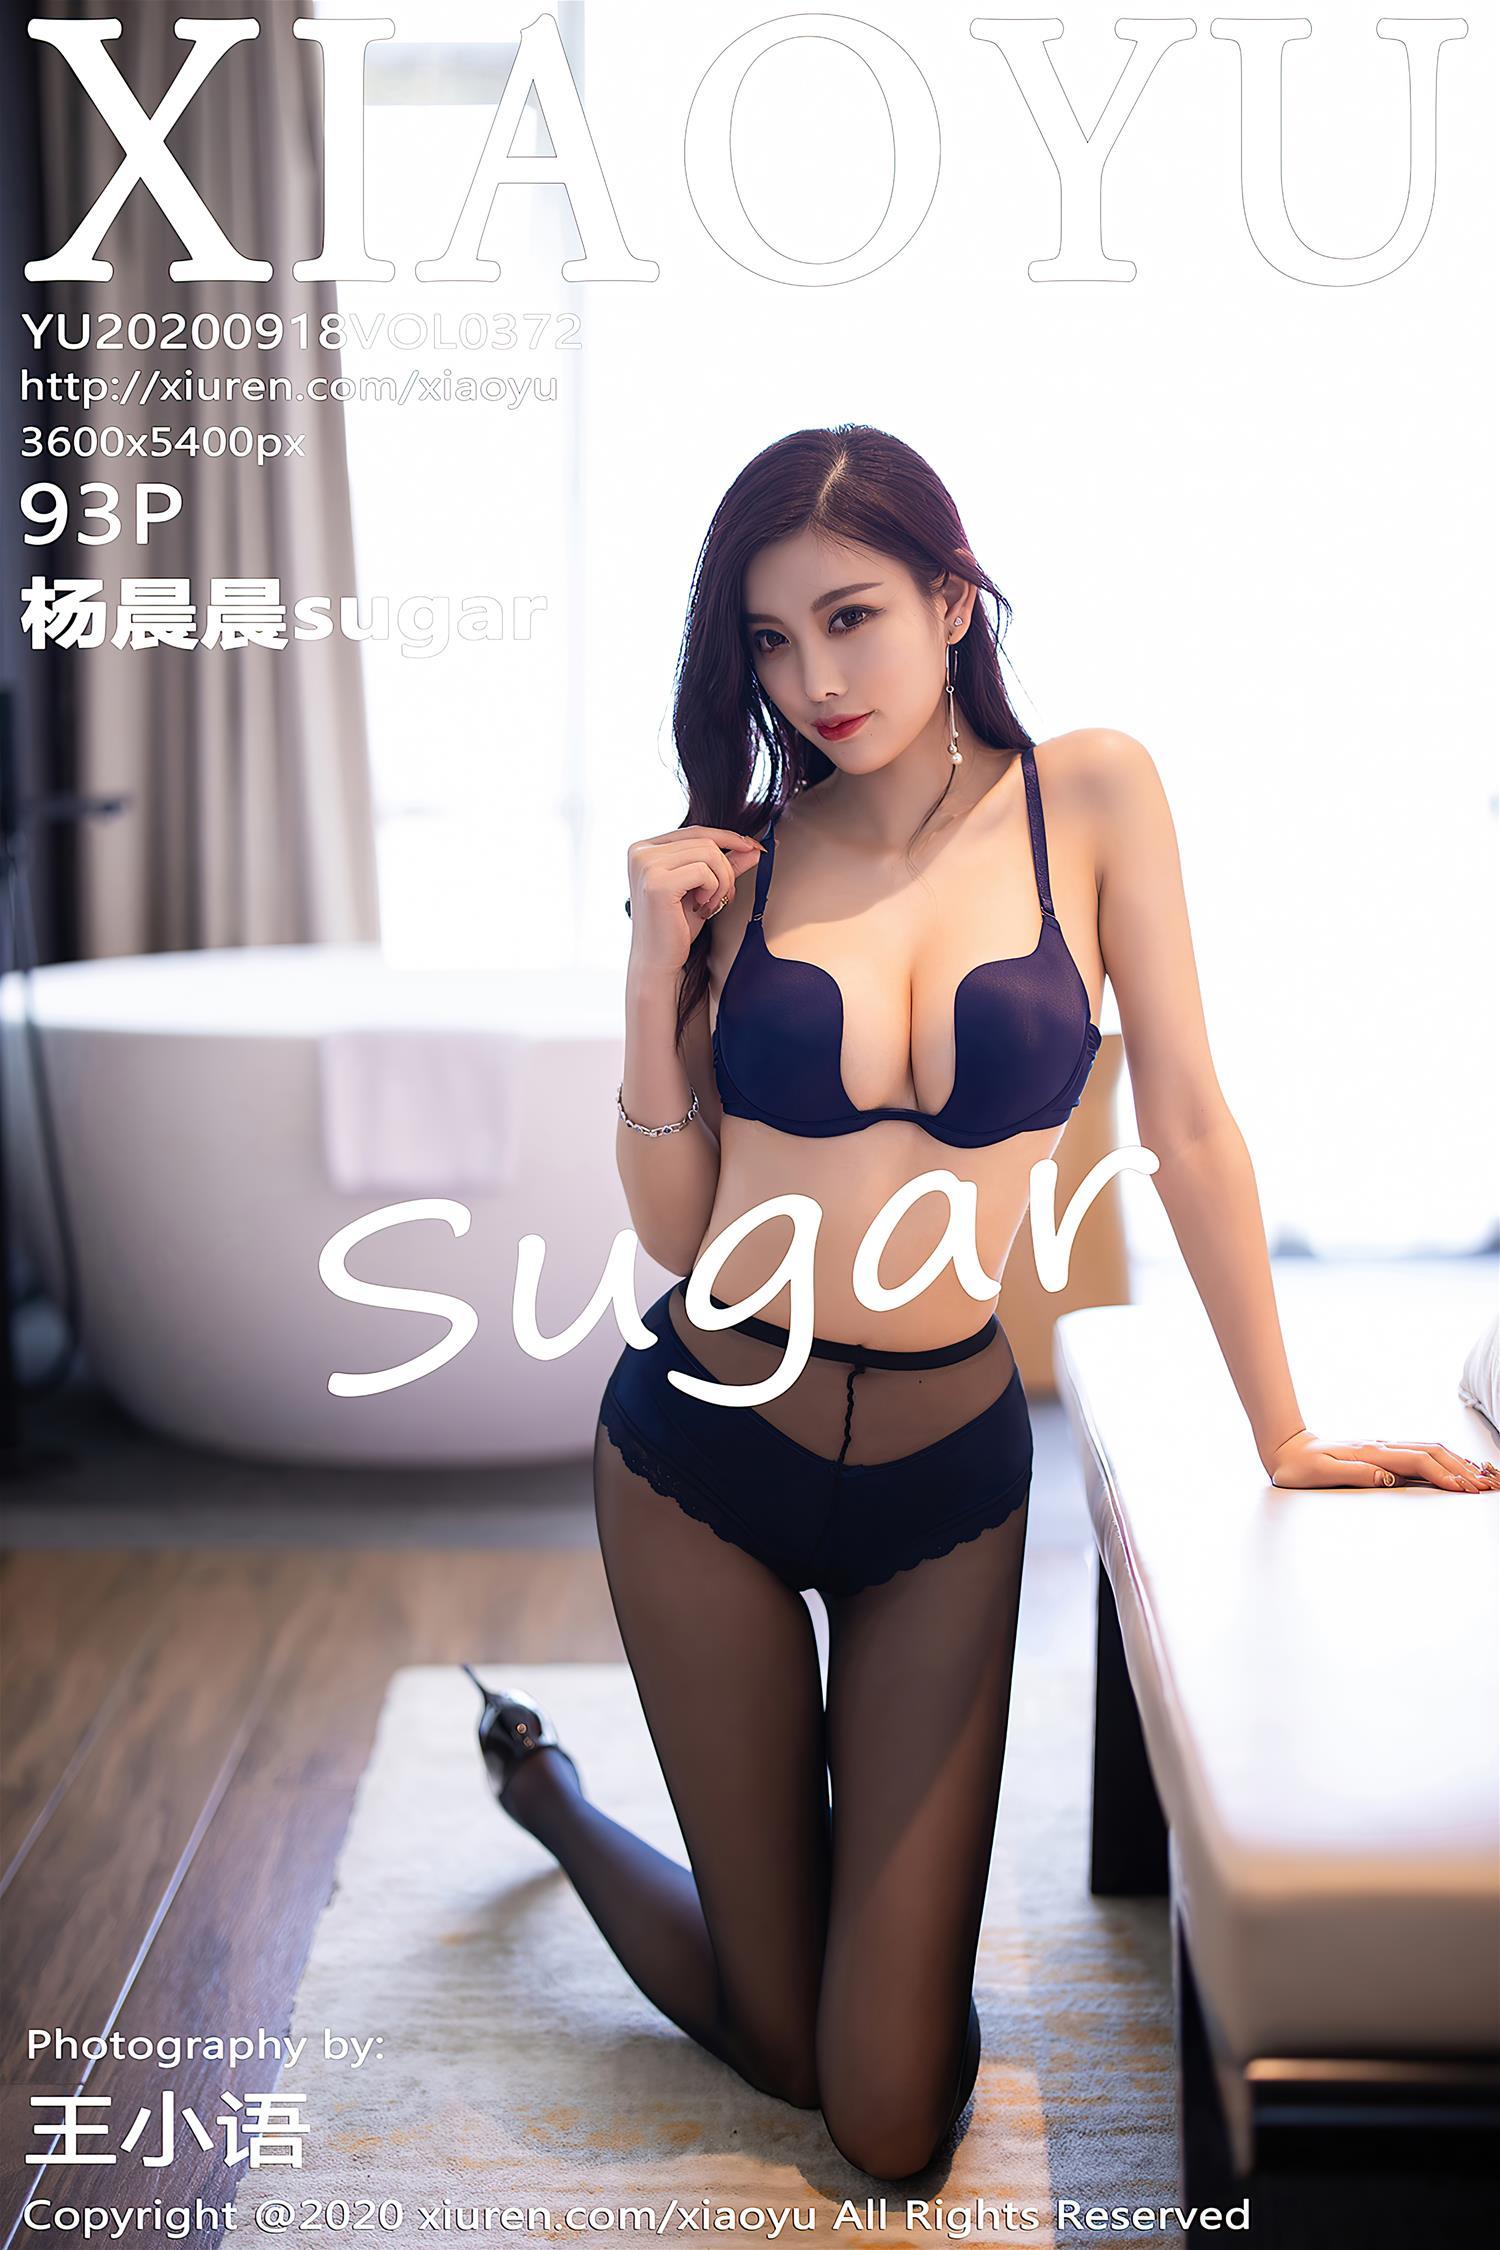 [XIAOYU语画界] 2020.09.18 VOL.372 杨晨晨sugar [94P]